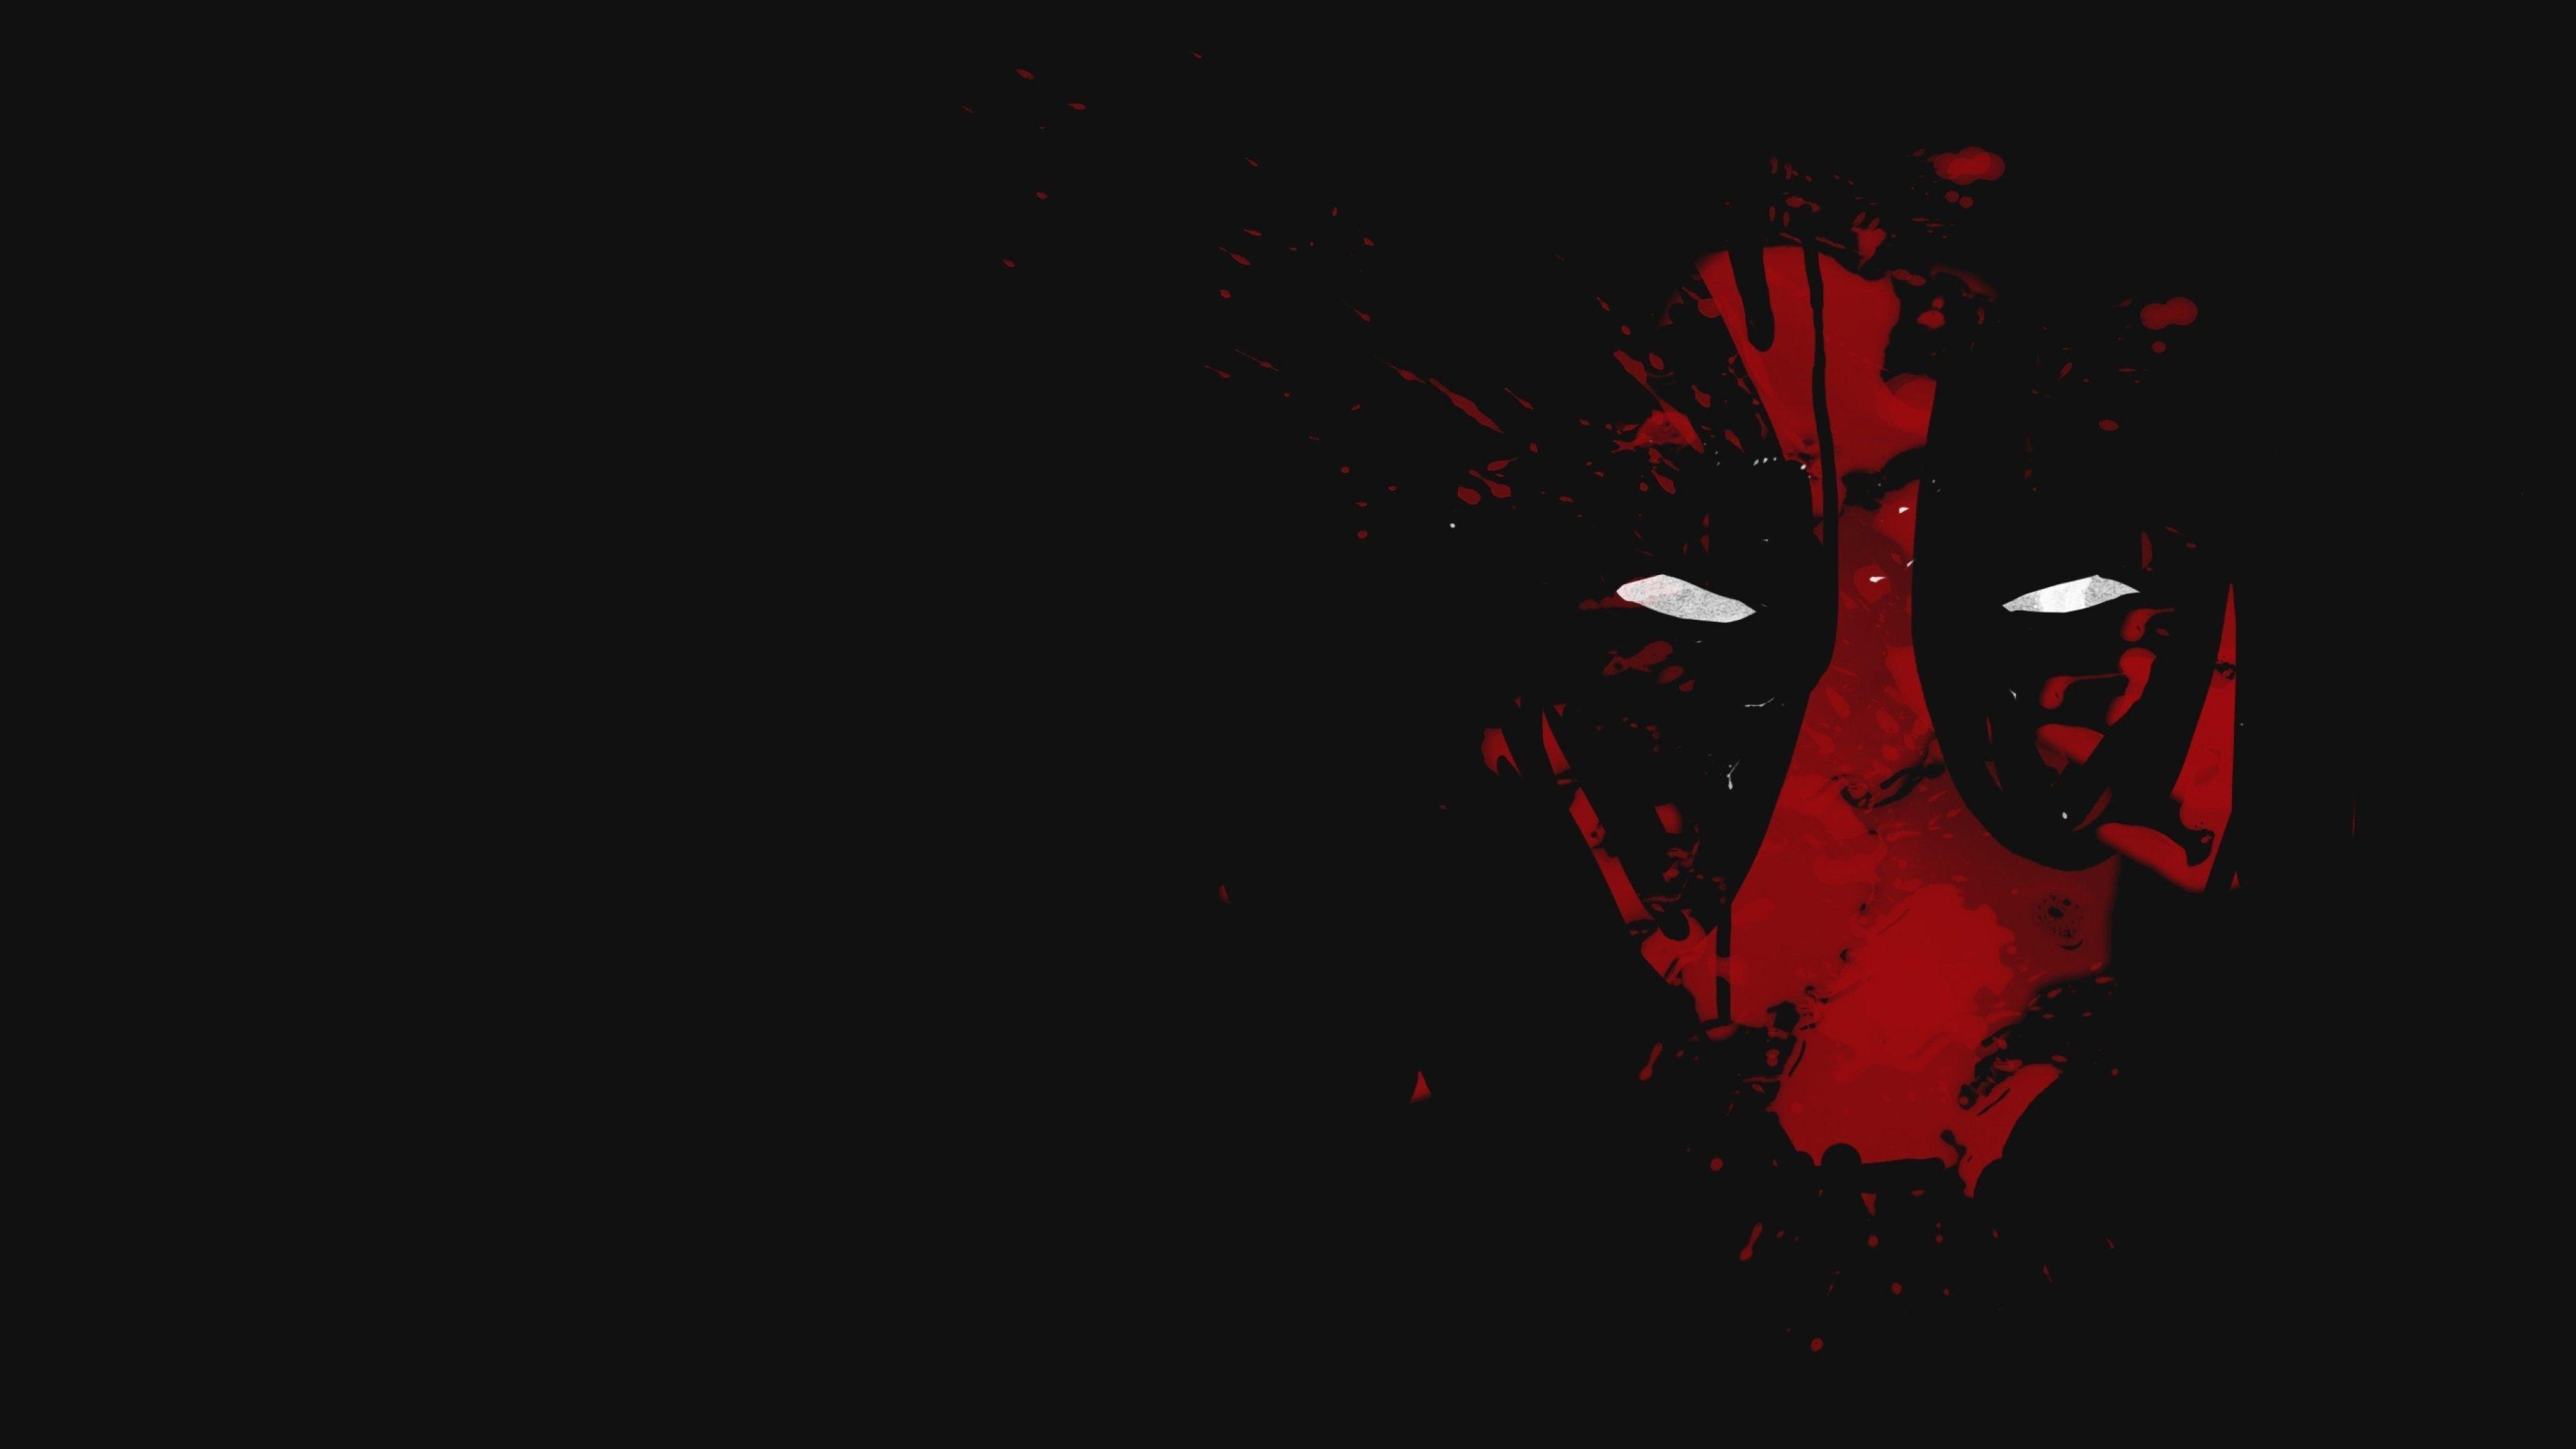 Awesome Laptop Backgrounds For Men Deadpool Wallpaper Deadpool Logo Wallpaper Computer Wallpaper Desktop Wallpapers